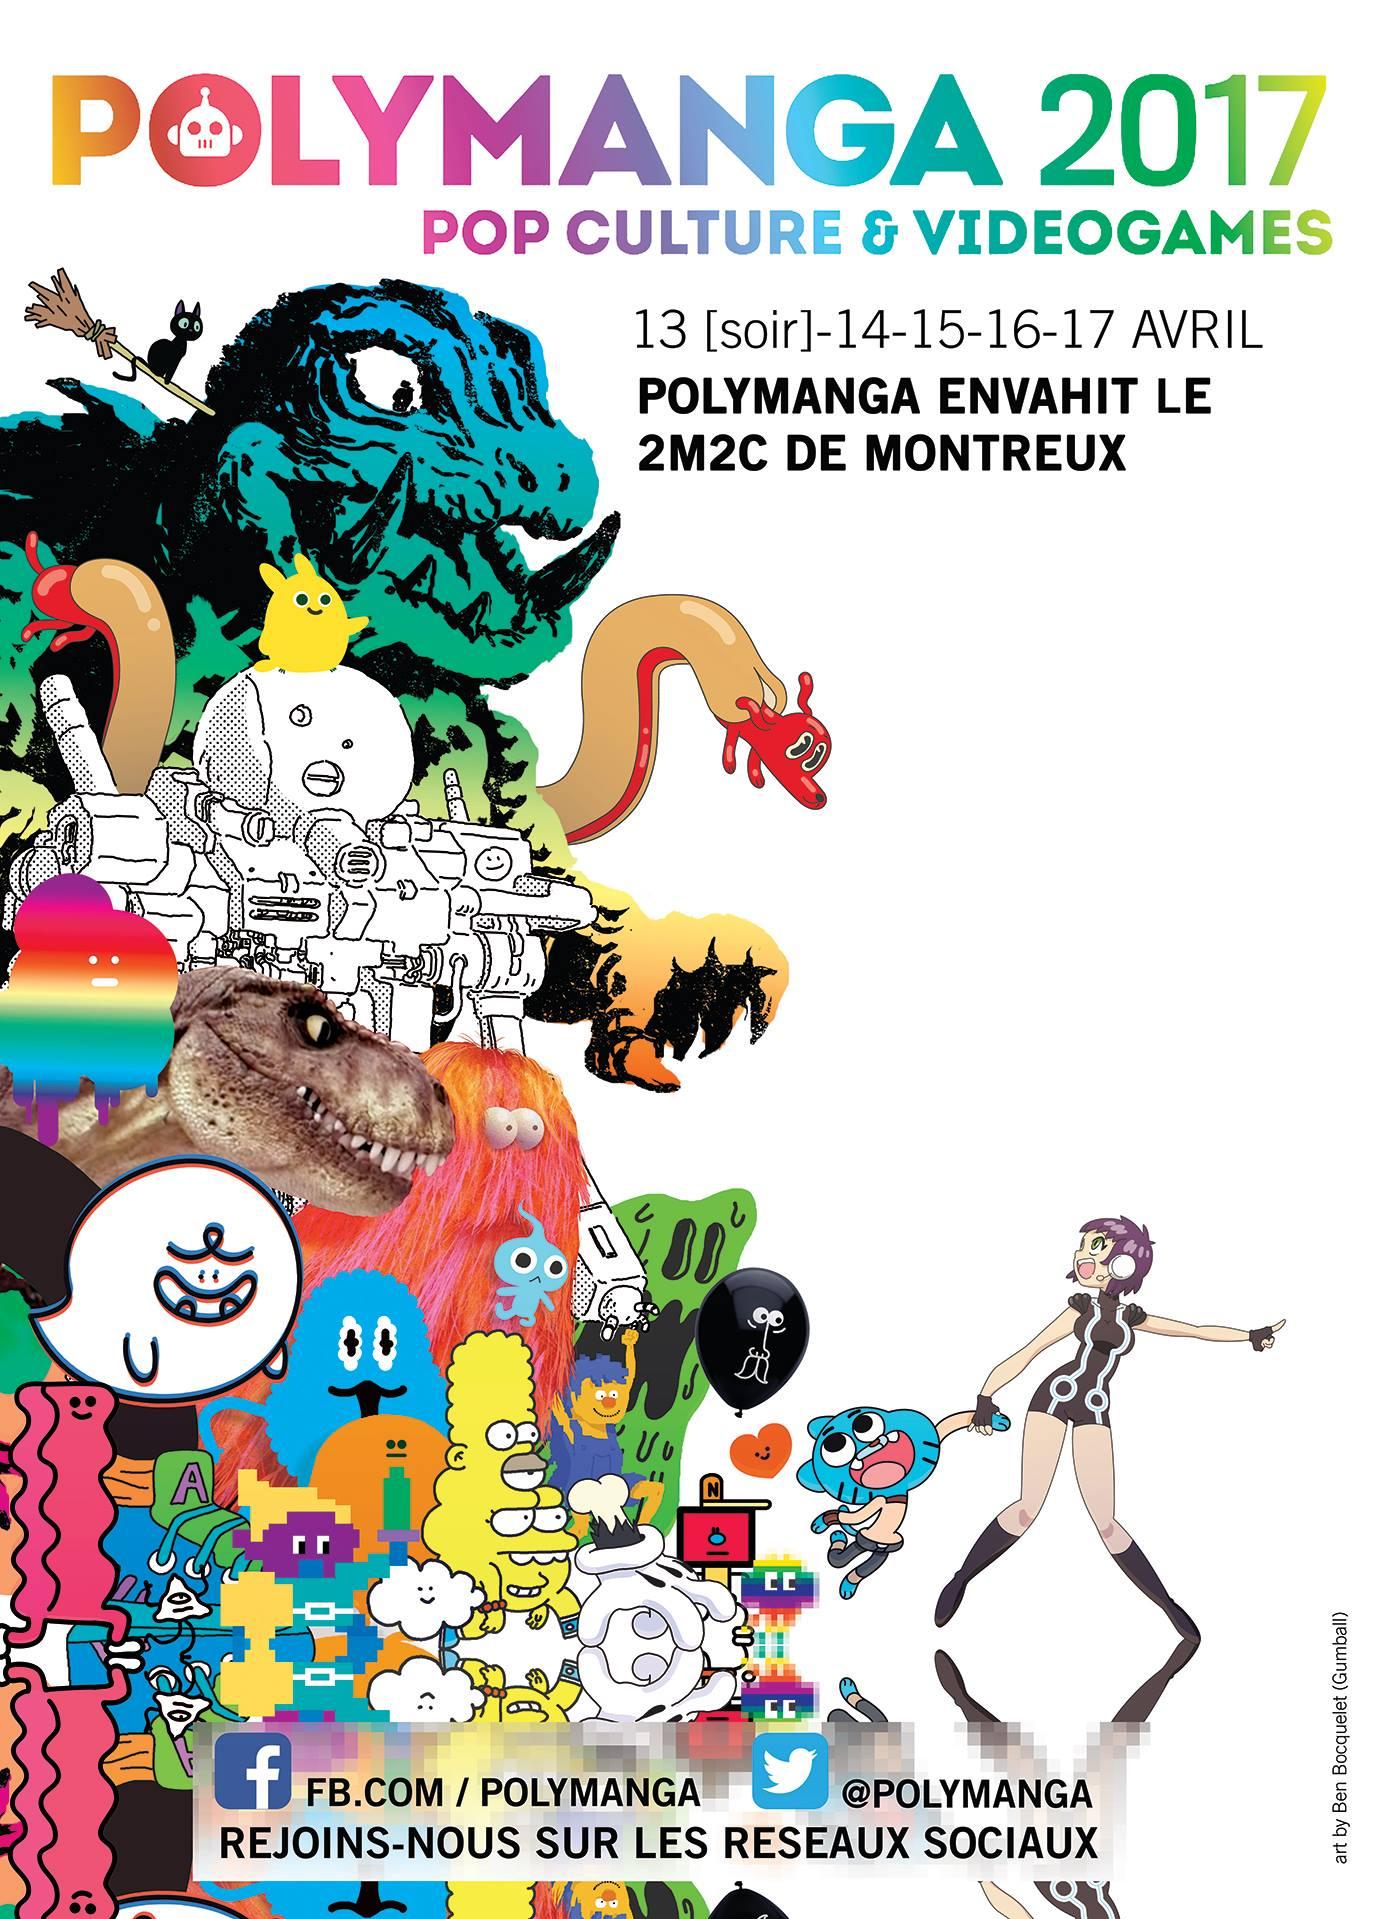 Polymanga 13 au 17 avril 2017 - Montreux 12909671_10154130495975956_6812903331618315507_o